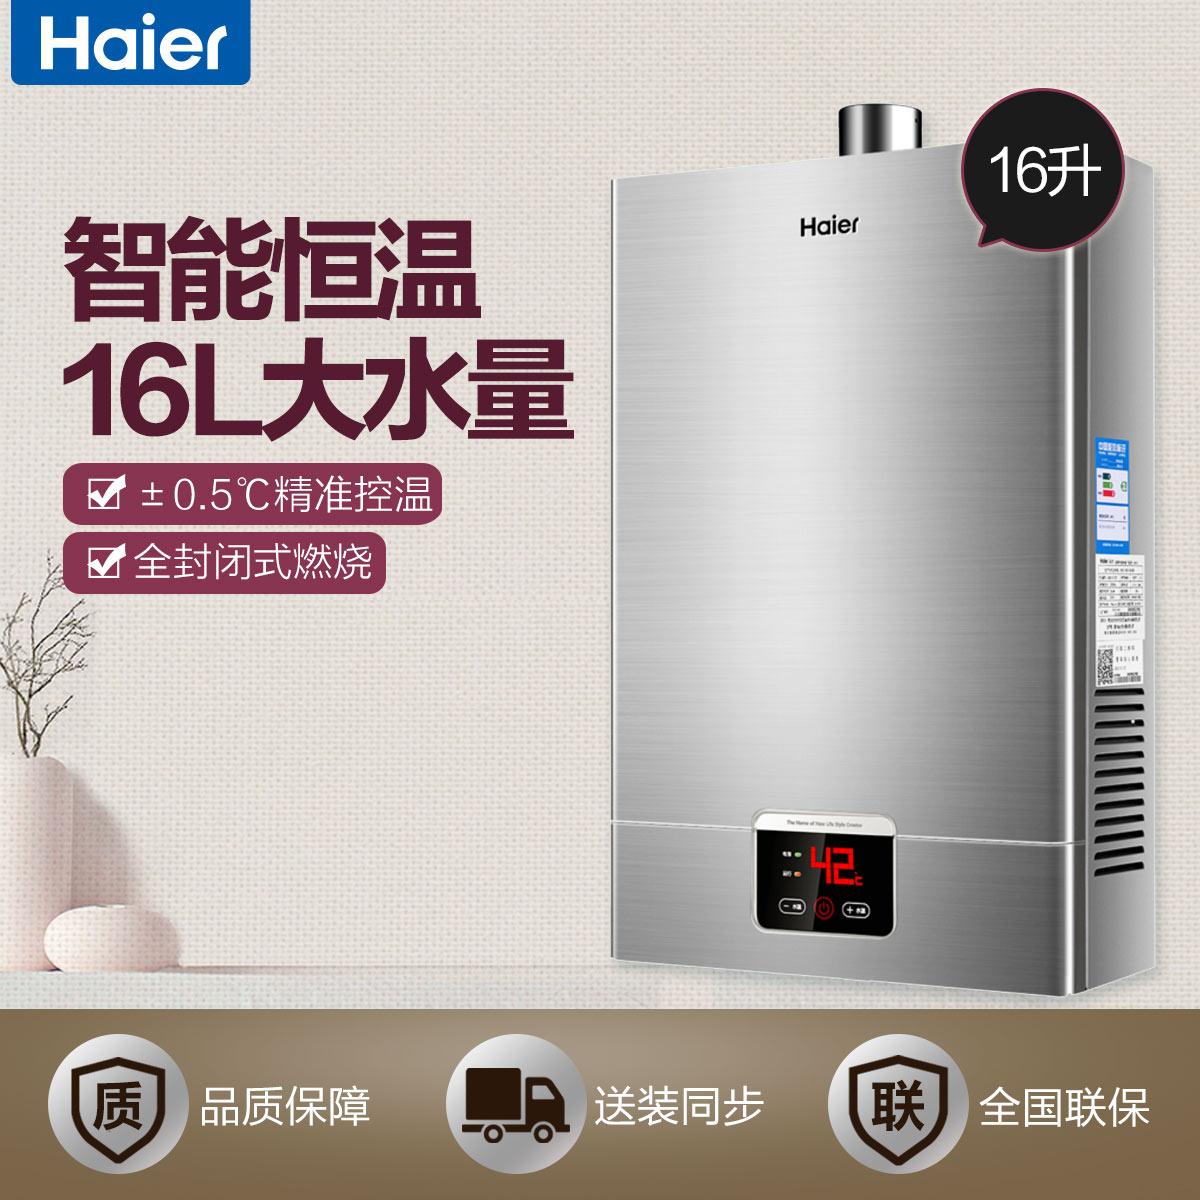 Haier/海尔 燃气热水器 JSQ32-UT(12T)